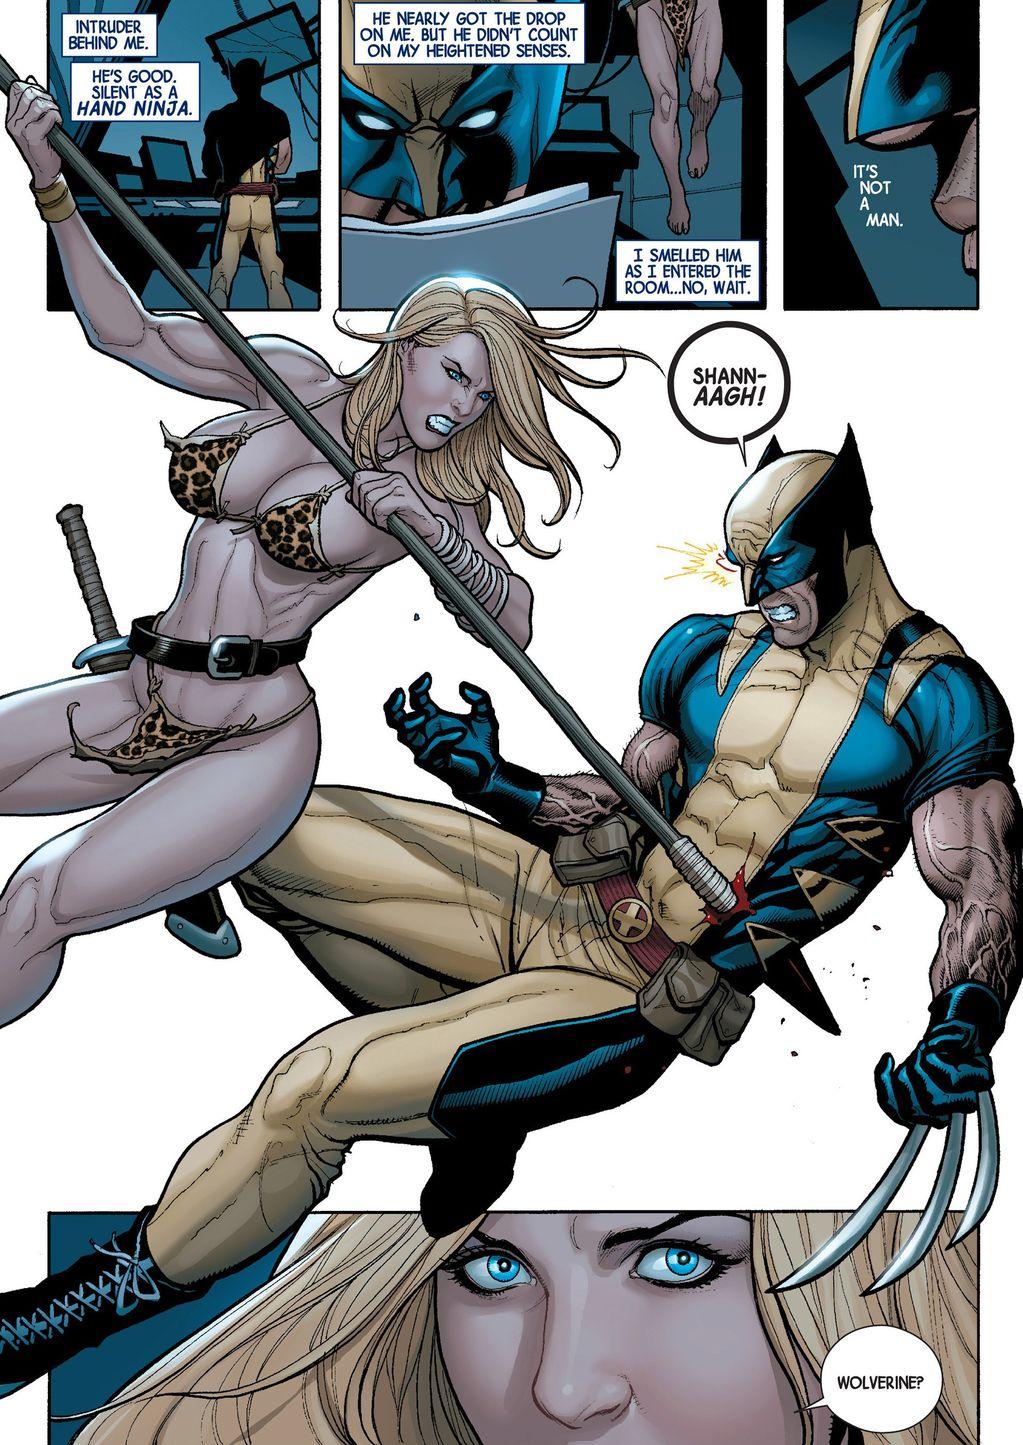 [Gentle Giant] Marvel Comics: Shanna 1/4 013